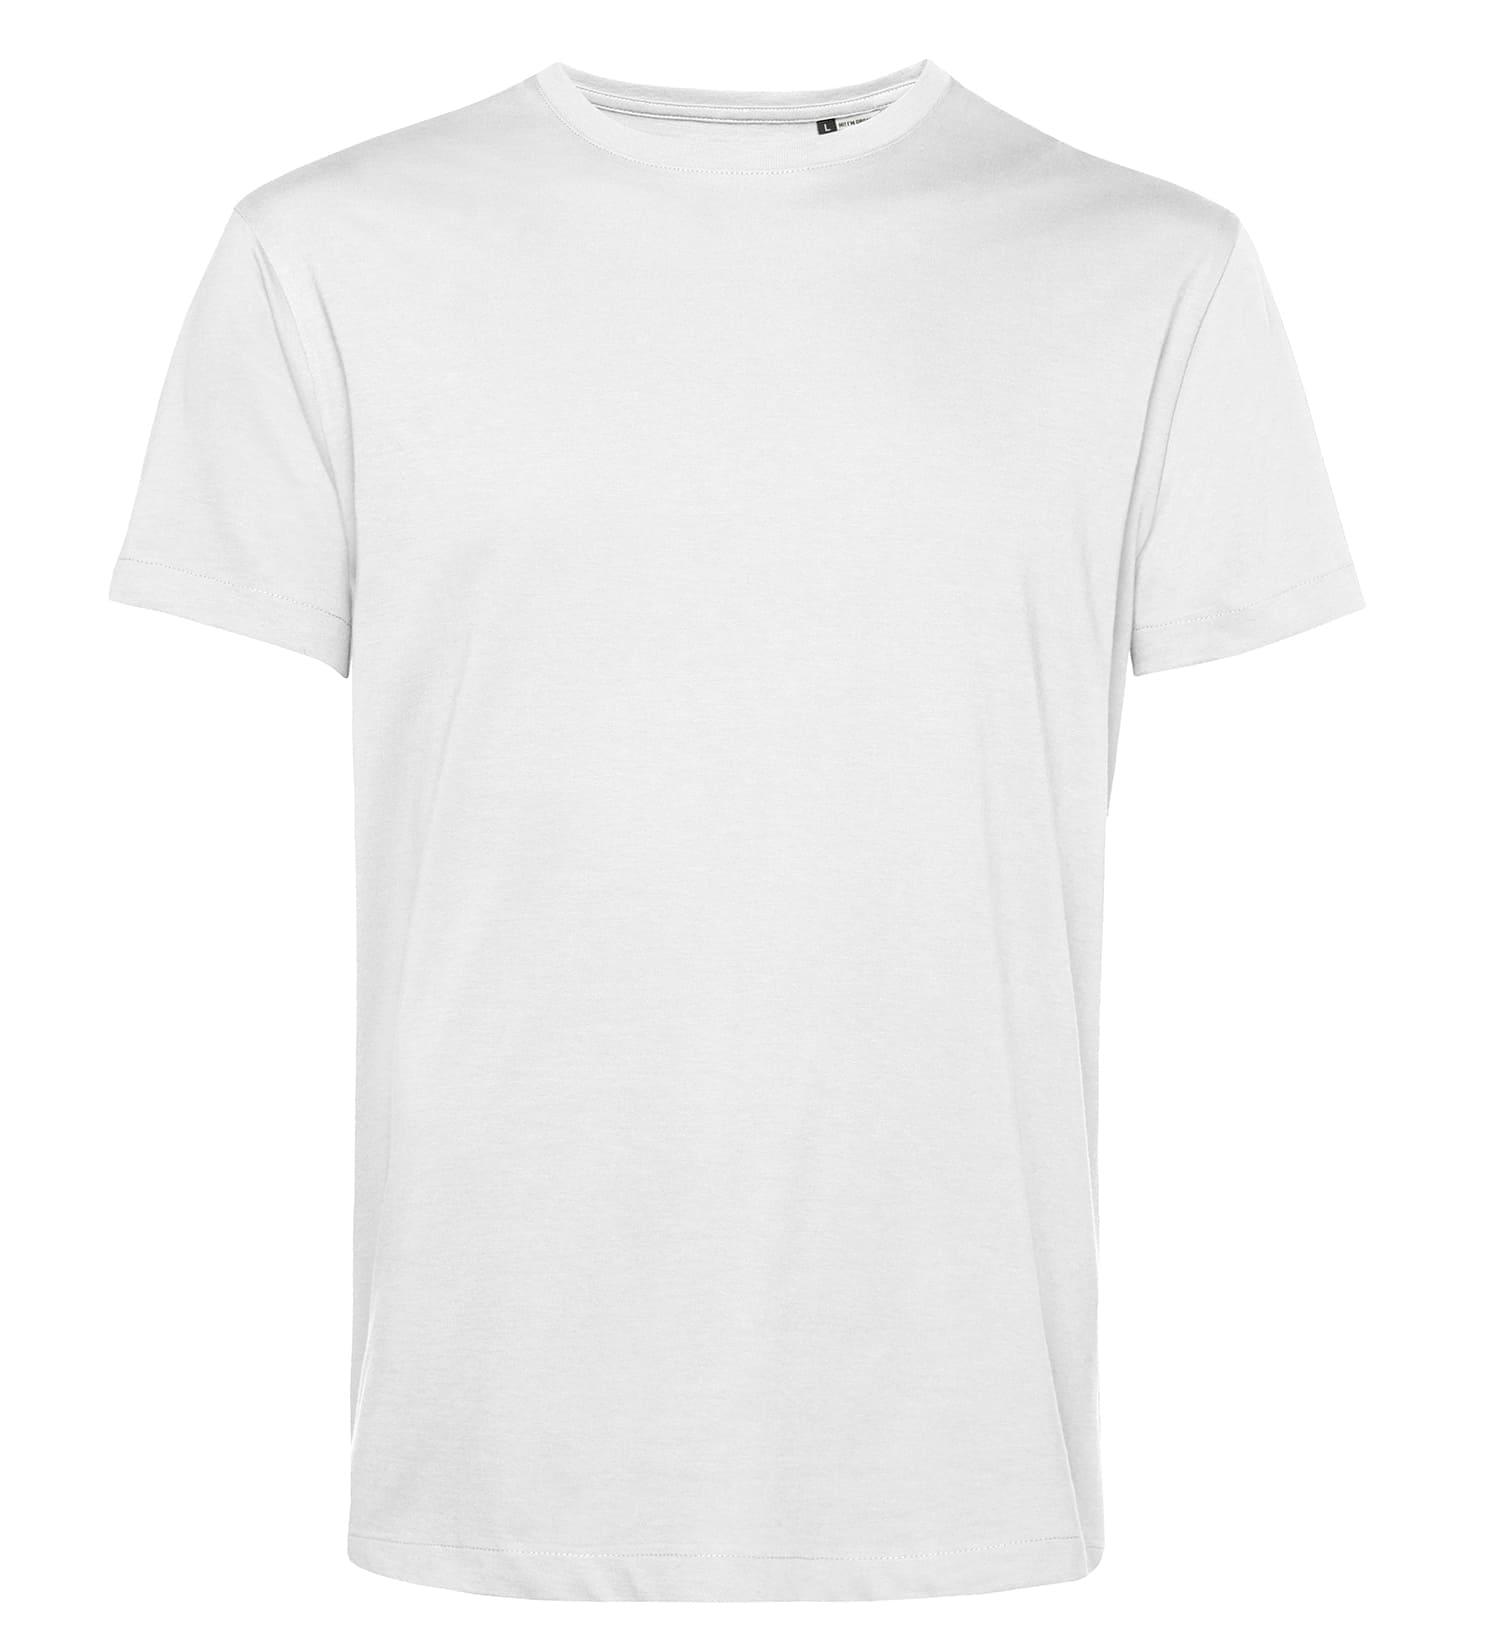 T-Shirtdruck- Herren